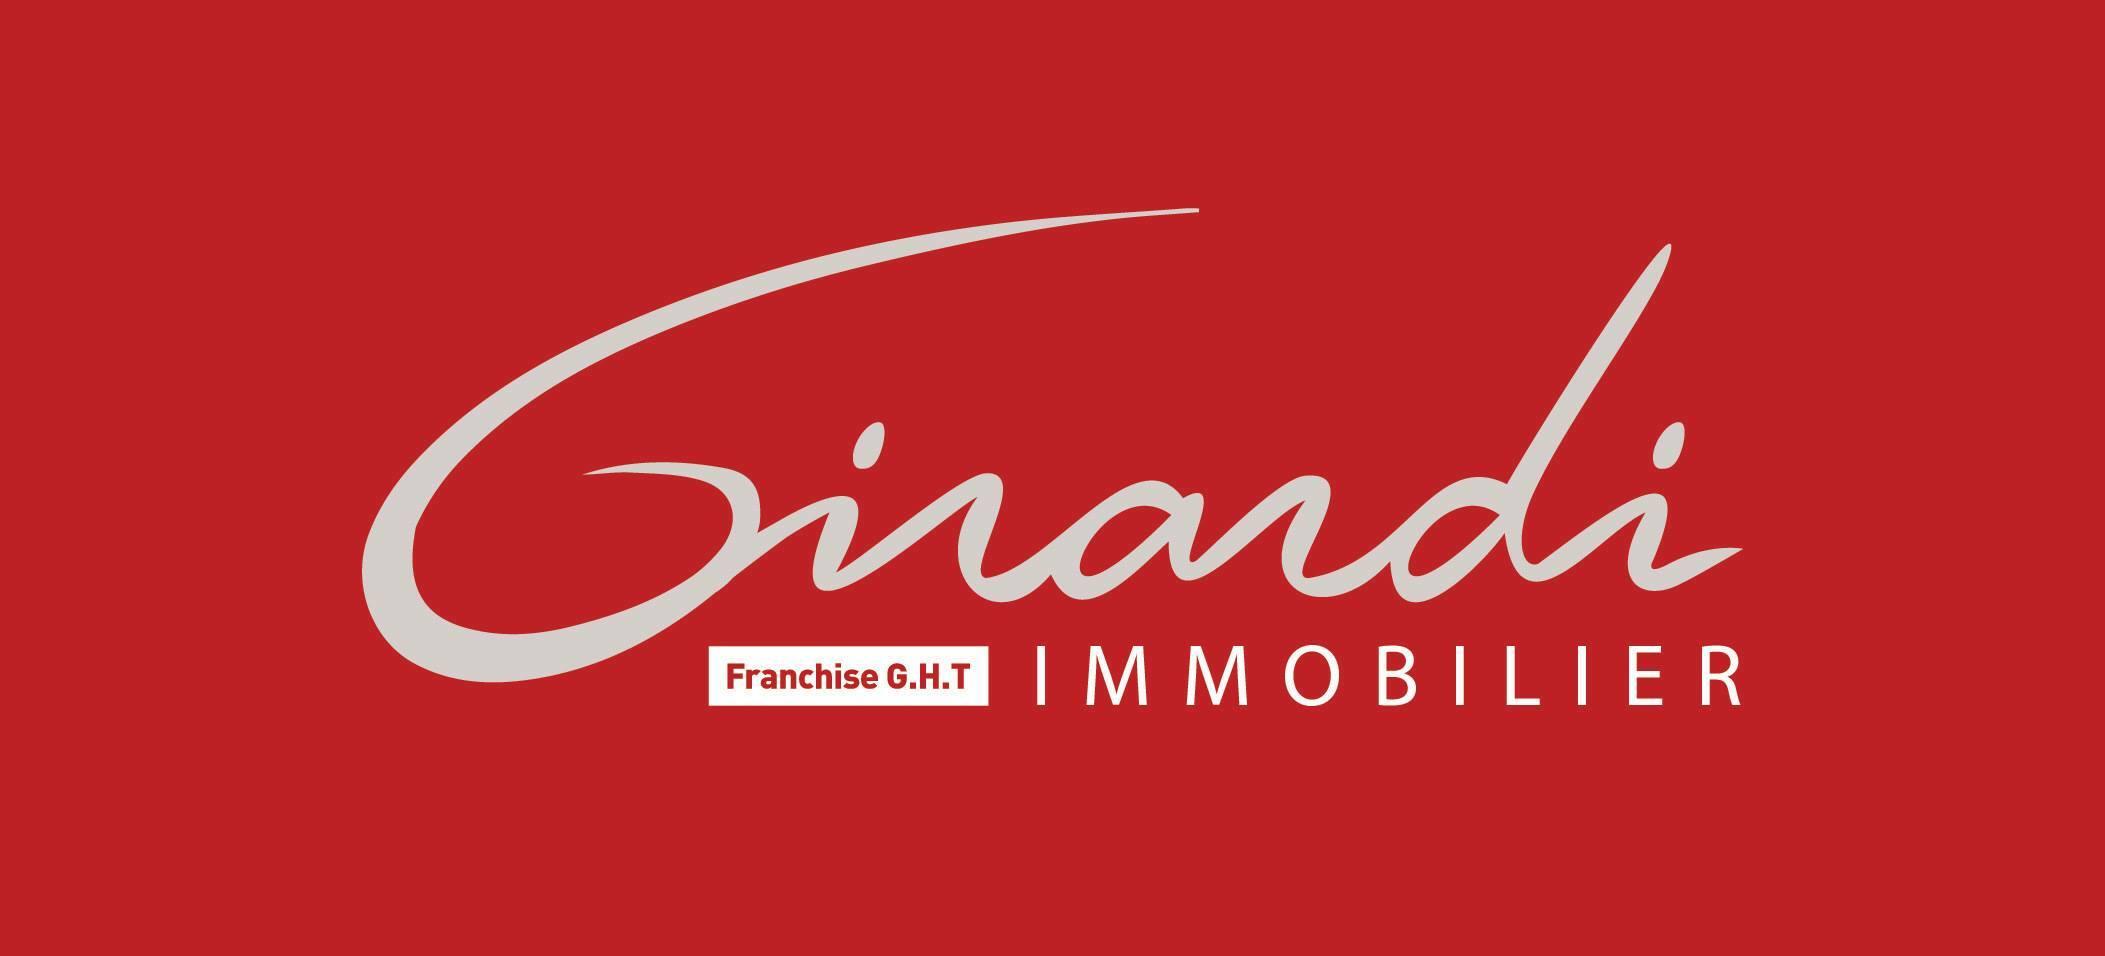 Logo de GIRARDI-IMMOBILIER